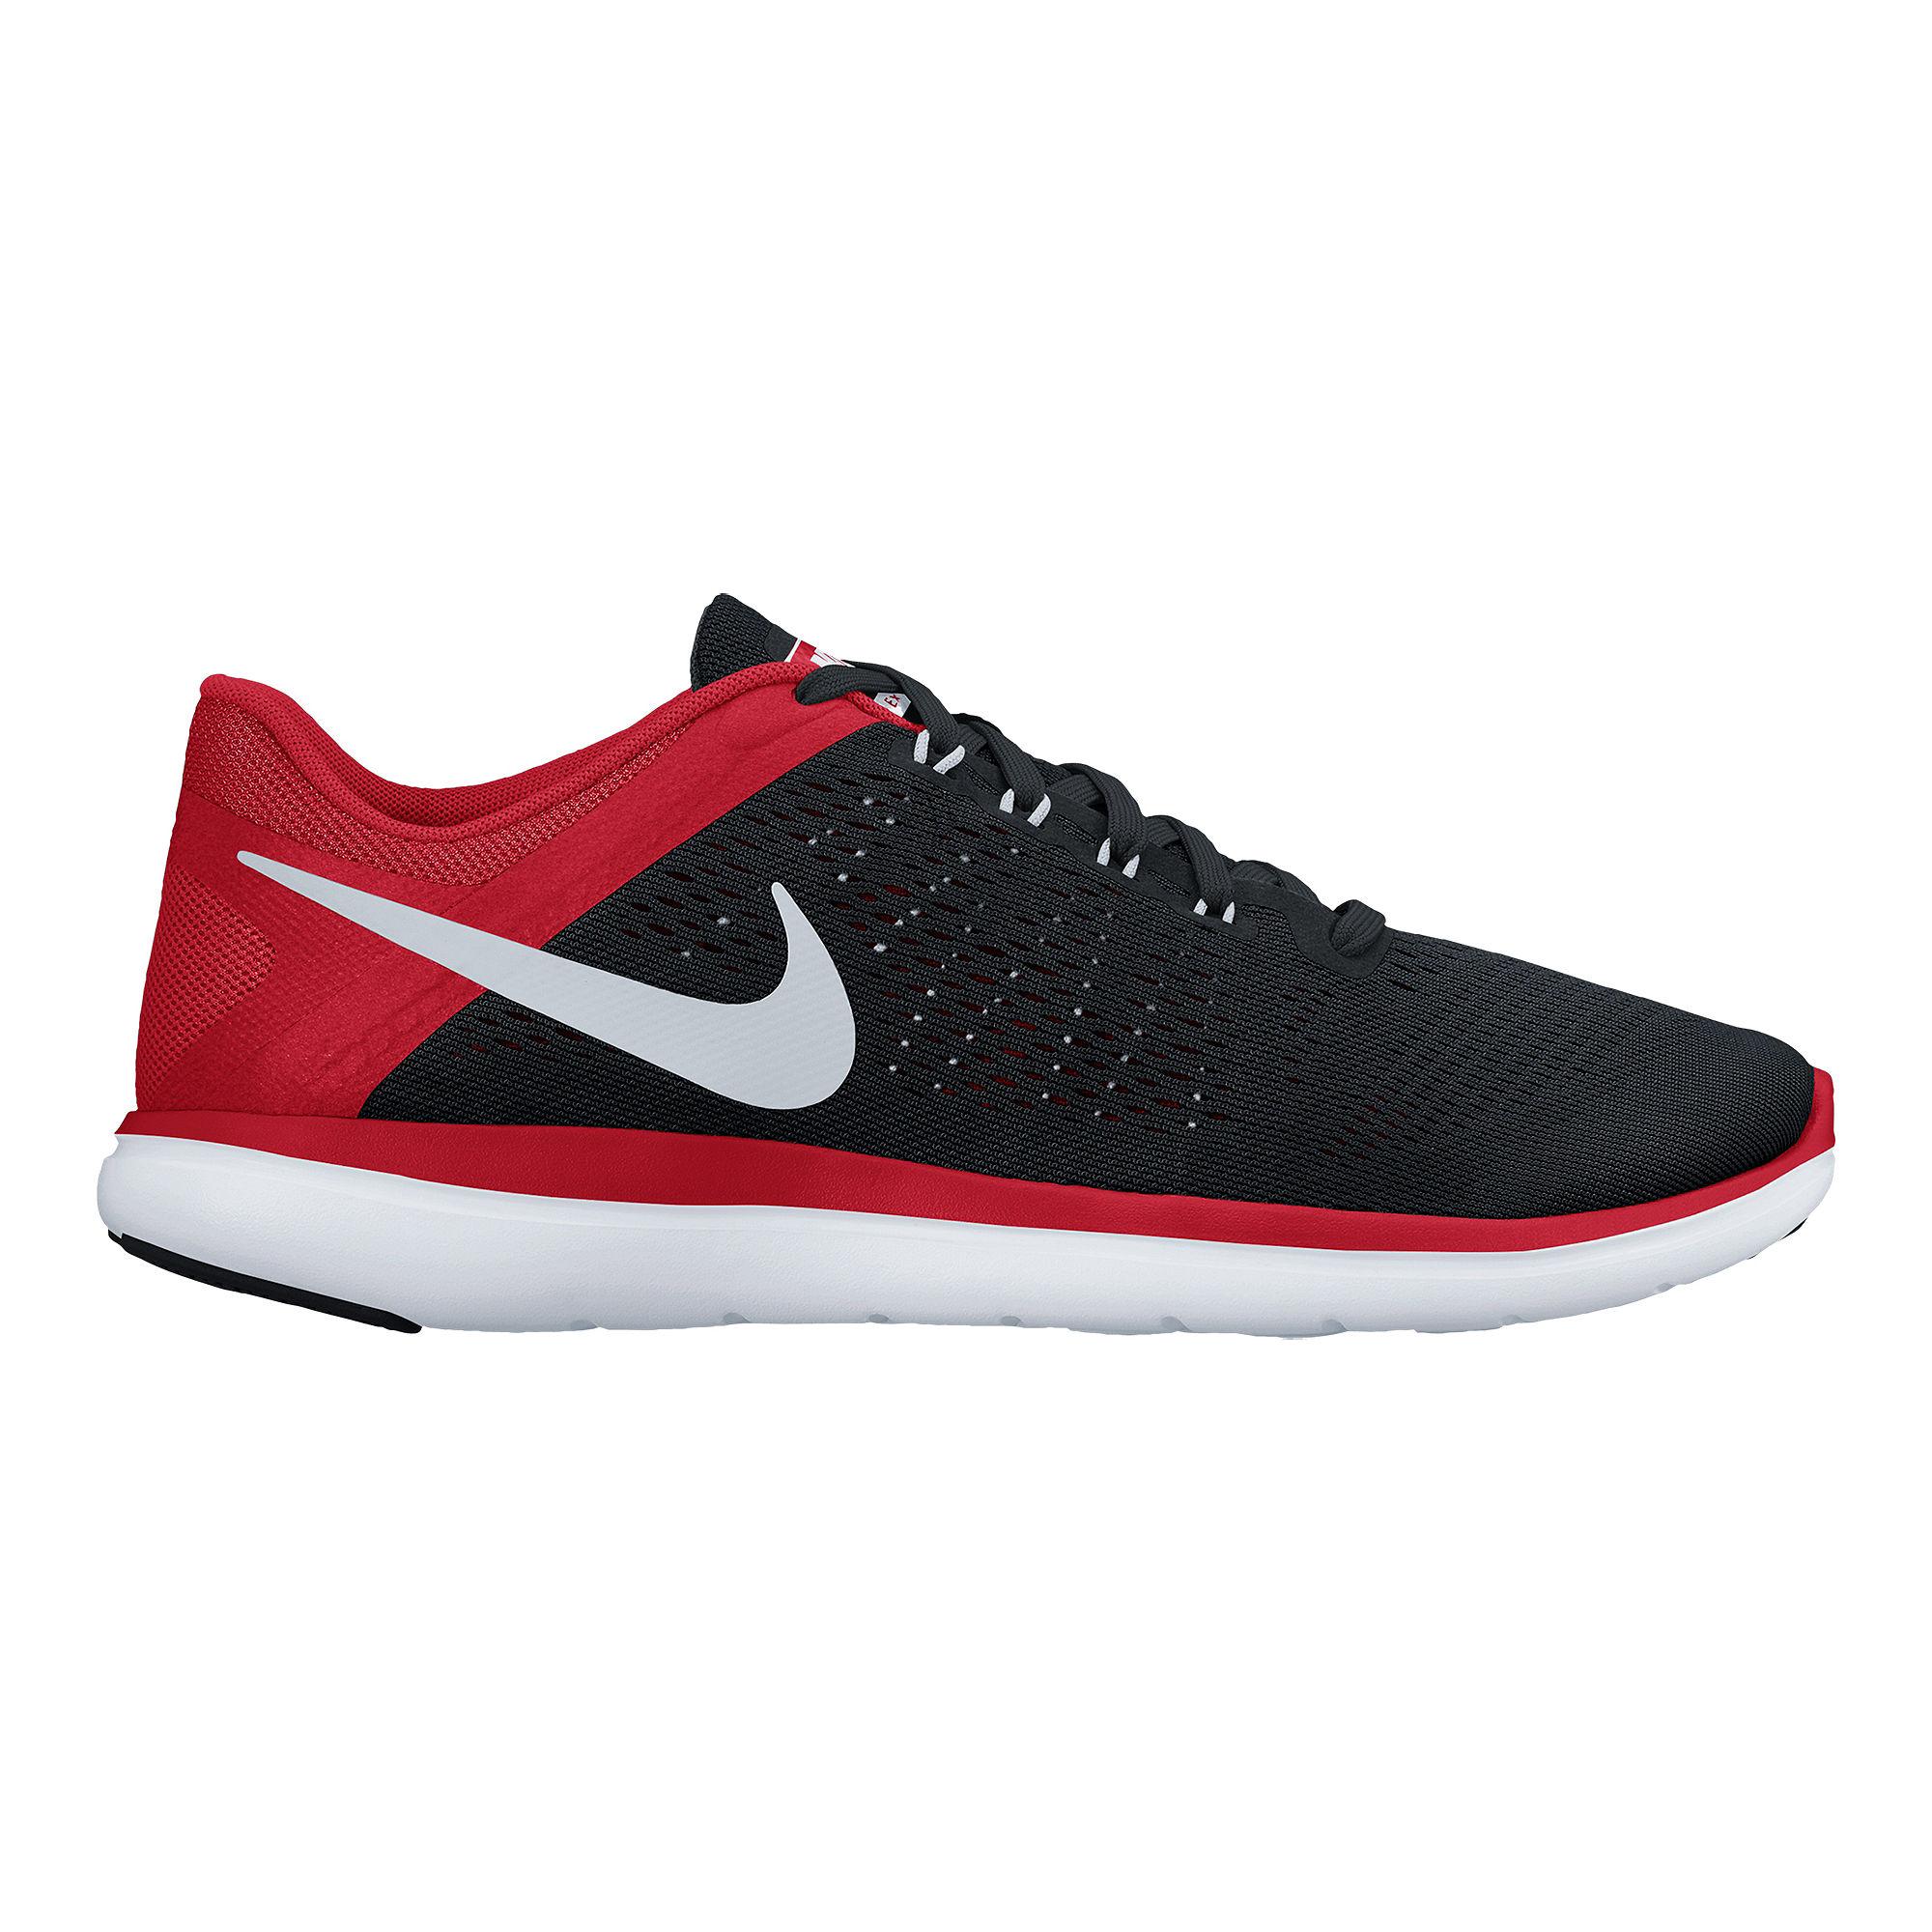 Men Nike Flex 2016 RN Running/Athletic Shoe Black/metallic Silver 830369-006